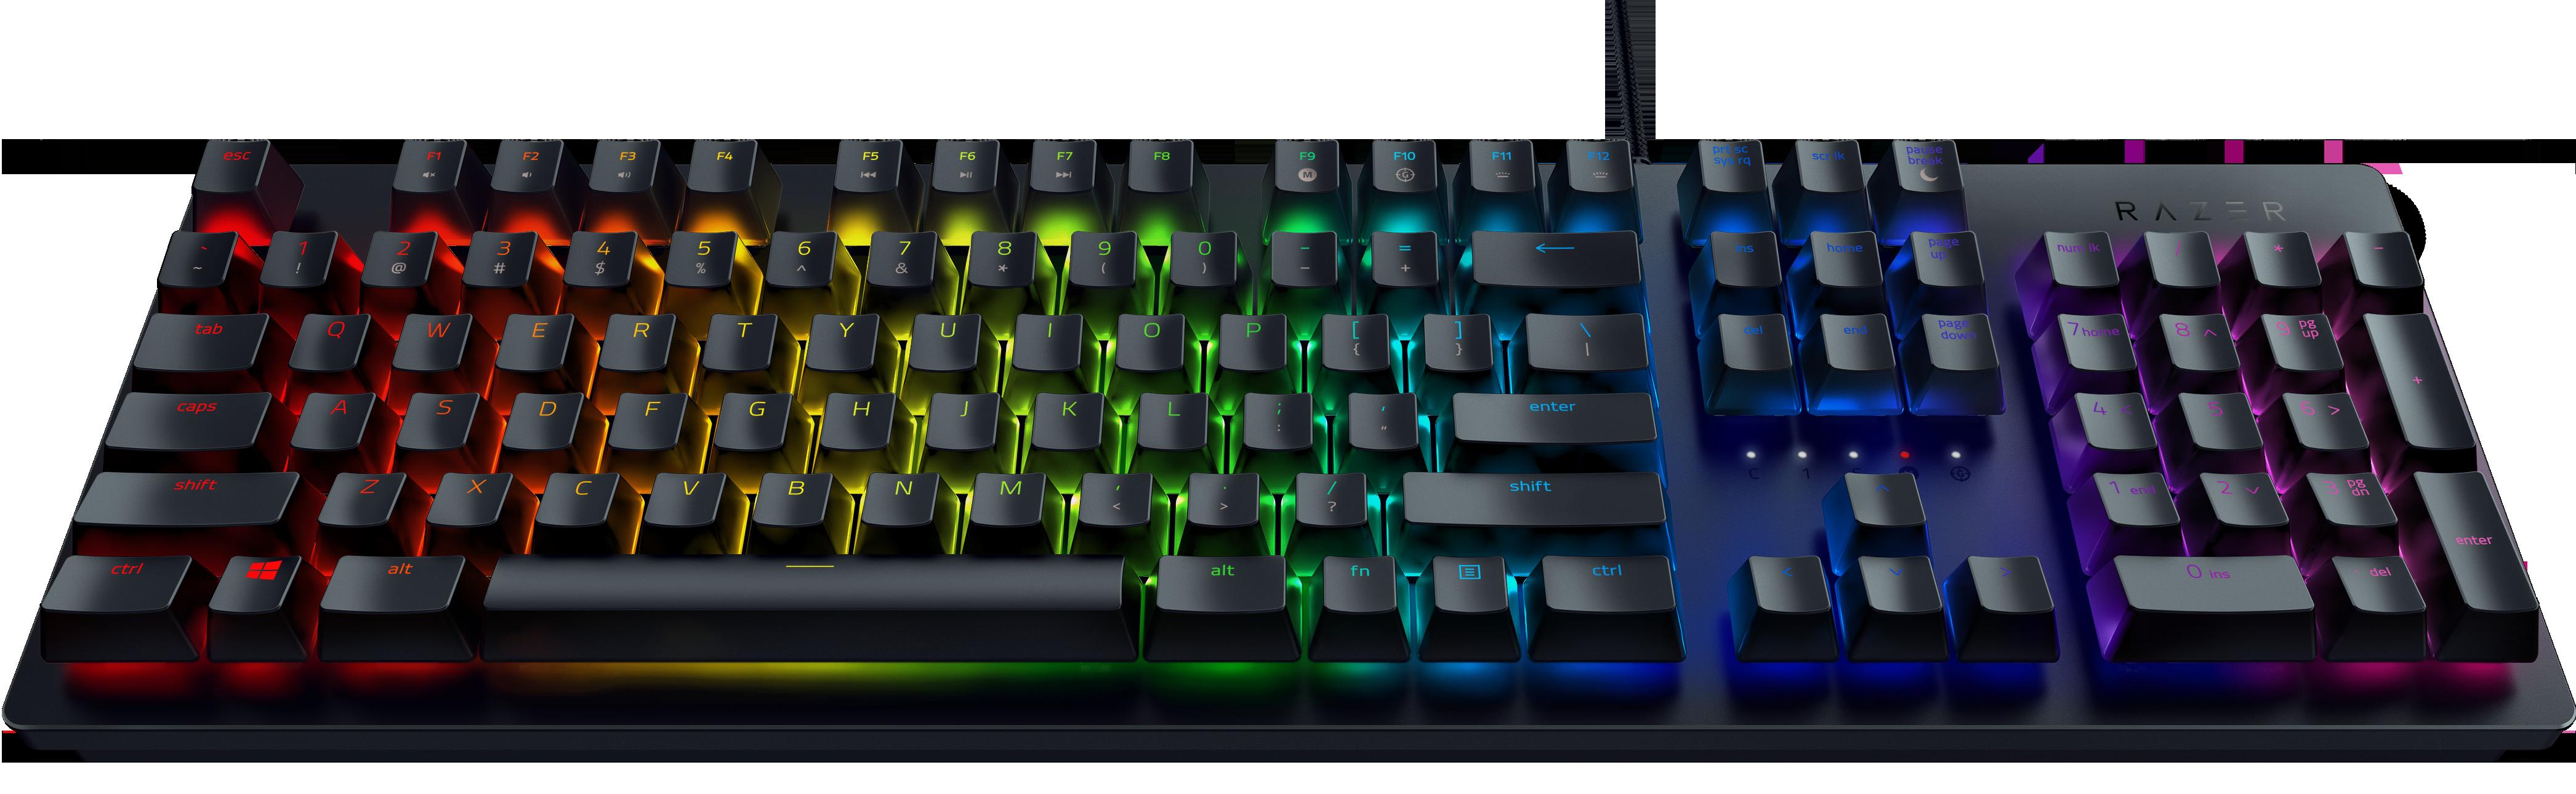 Механична клавиатура Razer Huntsman - 6